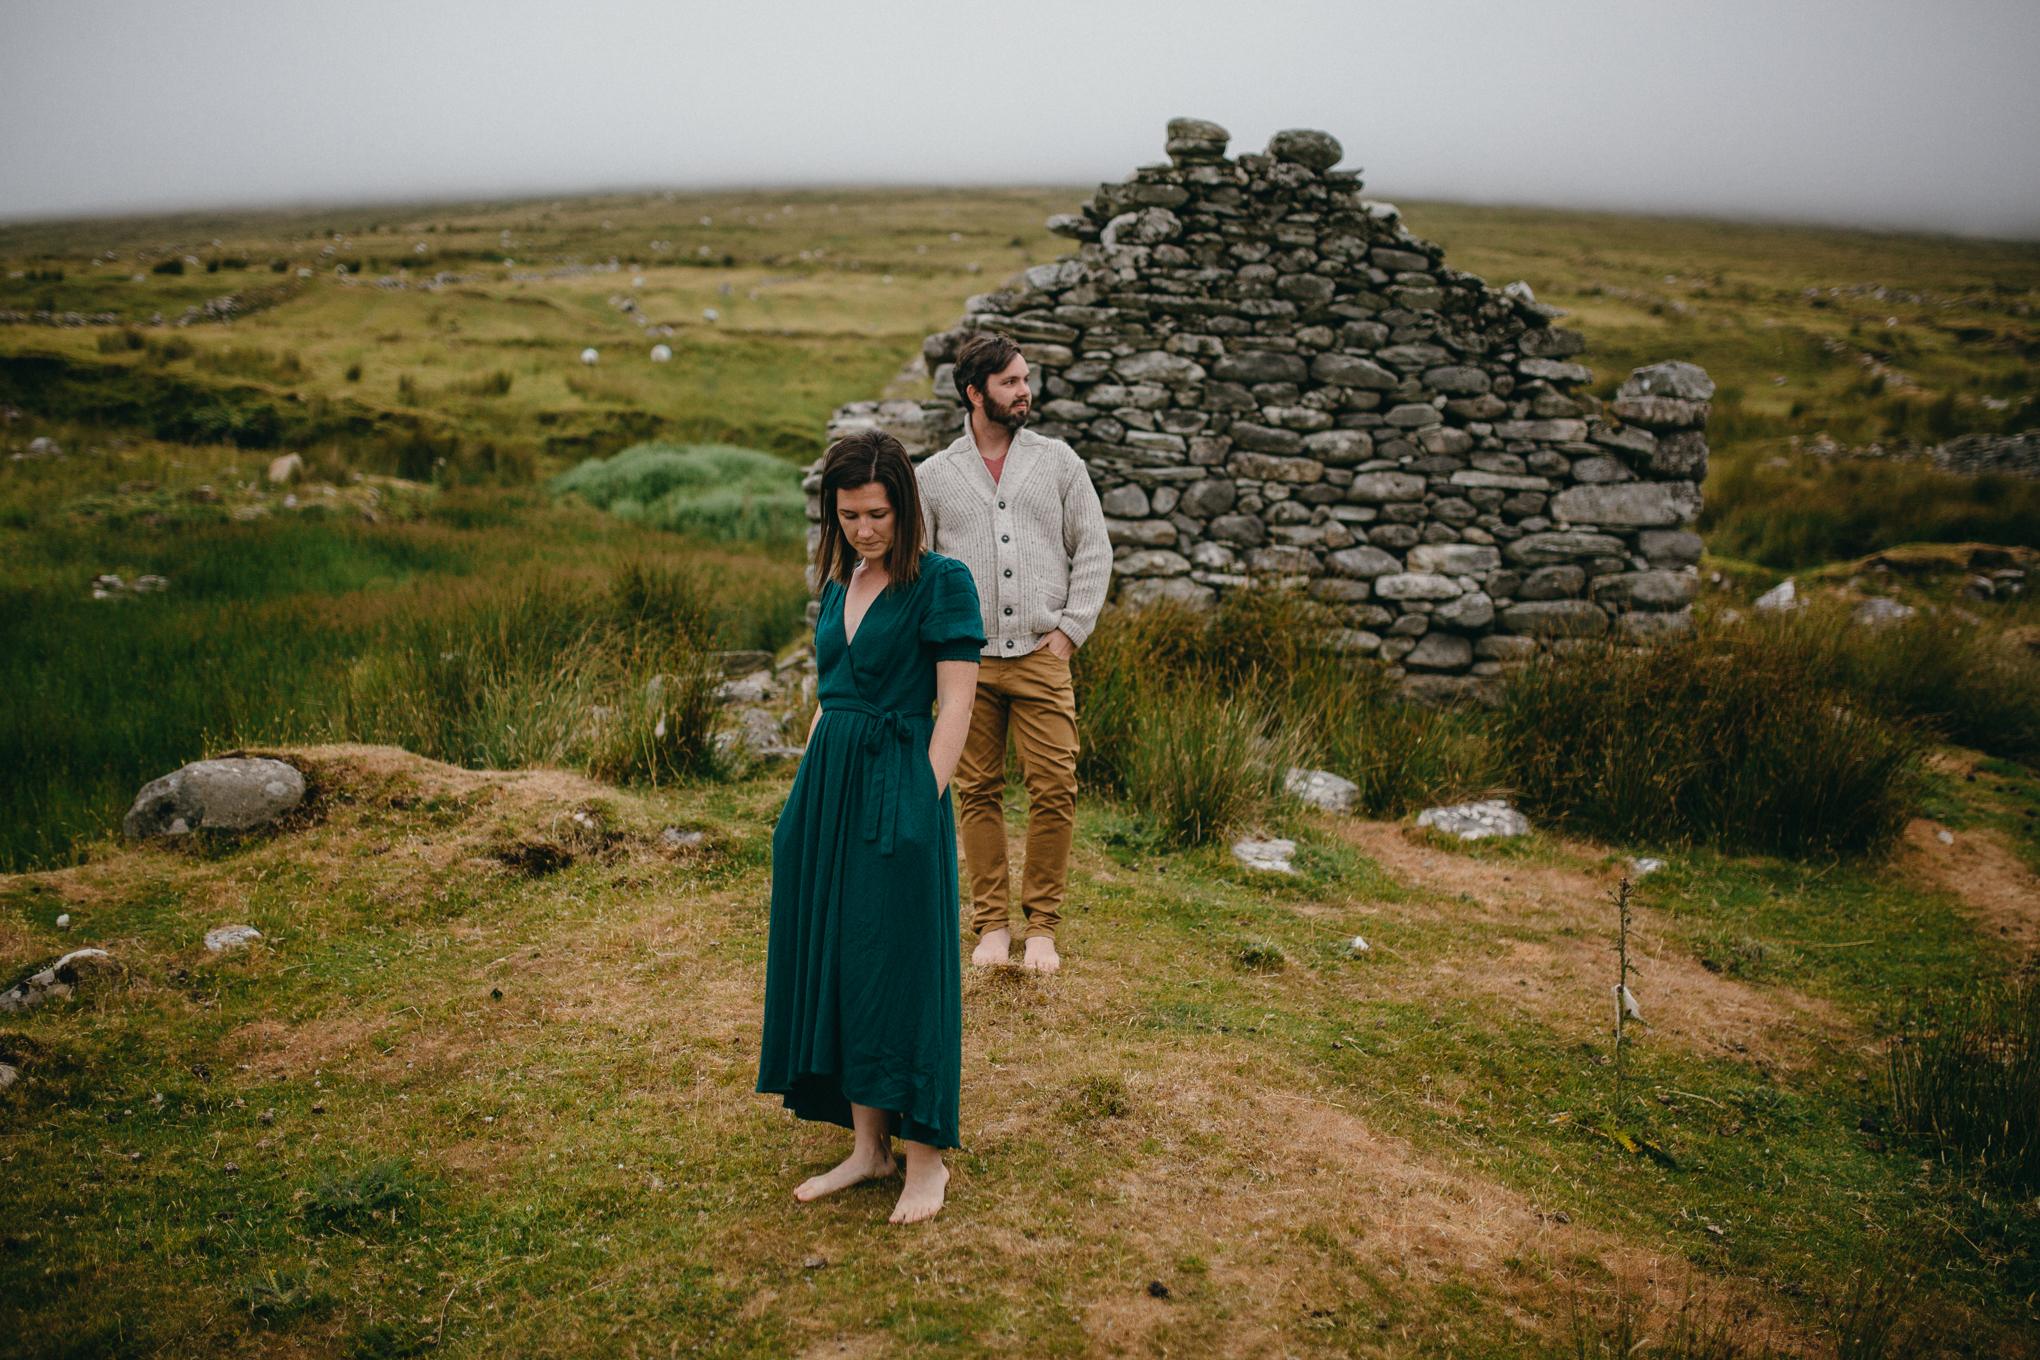 rowan+birch-ireland-anniversary-photos-25.jpg